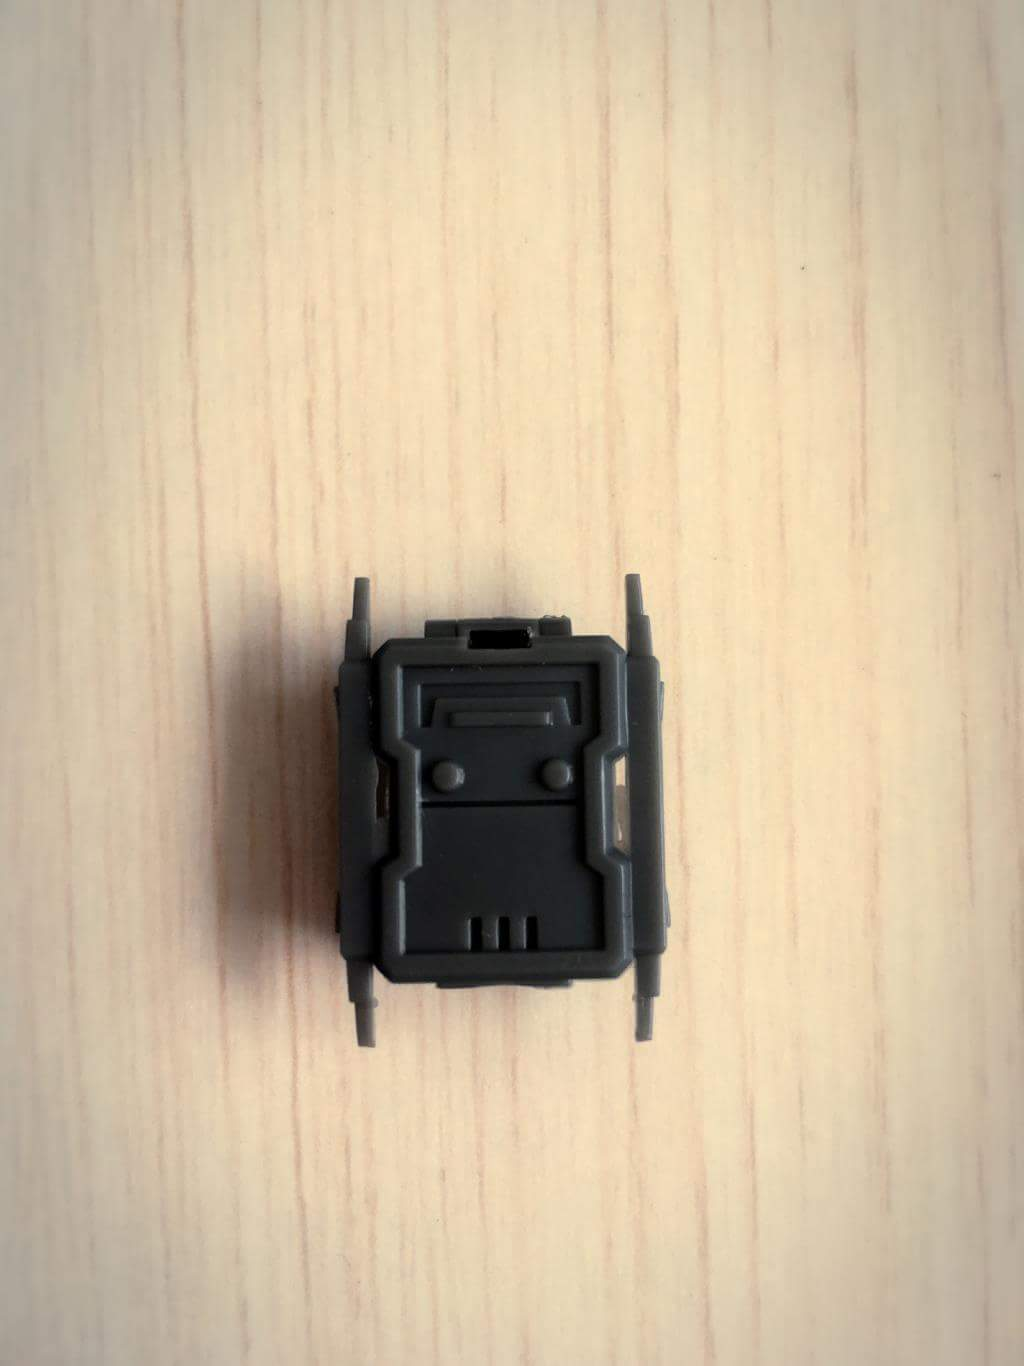 [ToyWorld] Produit Tiers - TW-M02A Combustor (Ramjet/Statoréacto), TW-M02B Assault (Thrust/Fatalo), TW-M02C Requiem (Dirge/Funébro) BooEUUgv